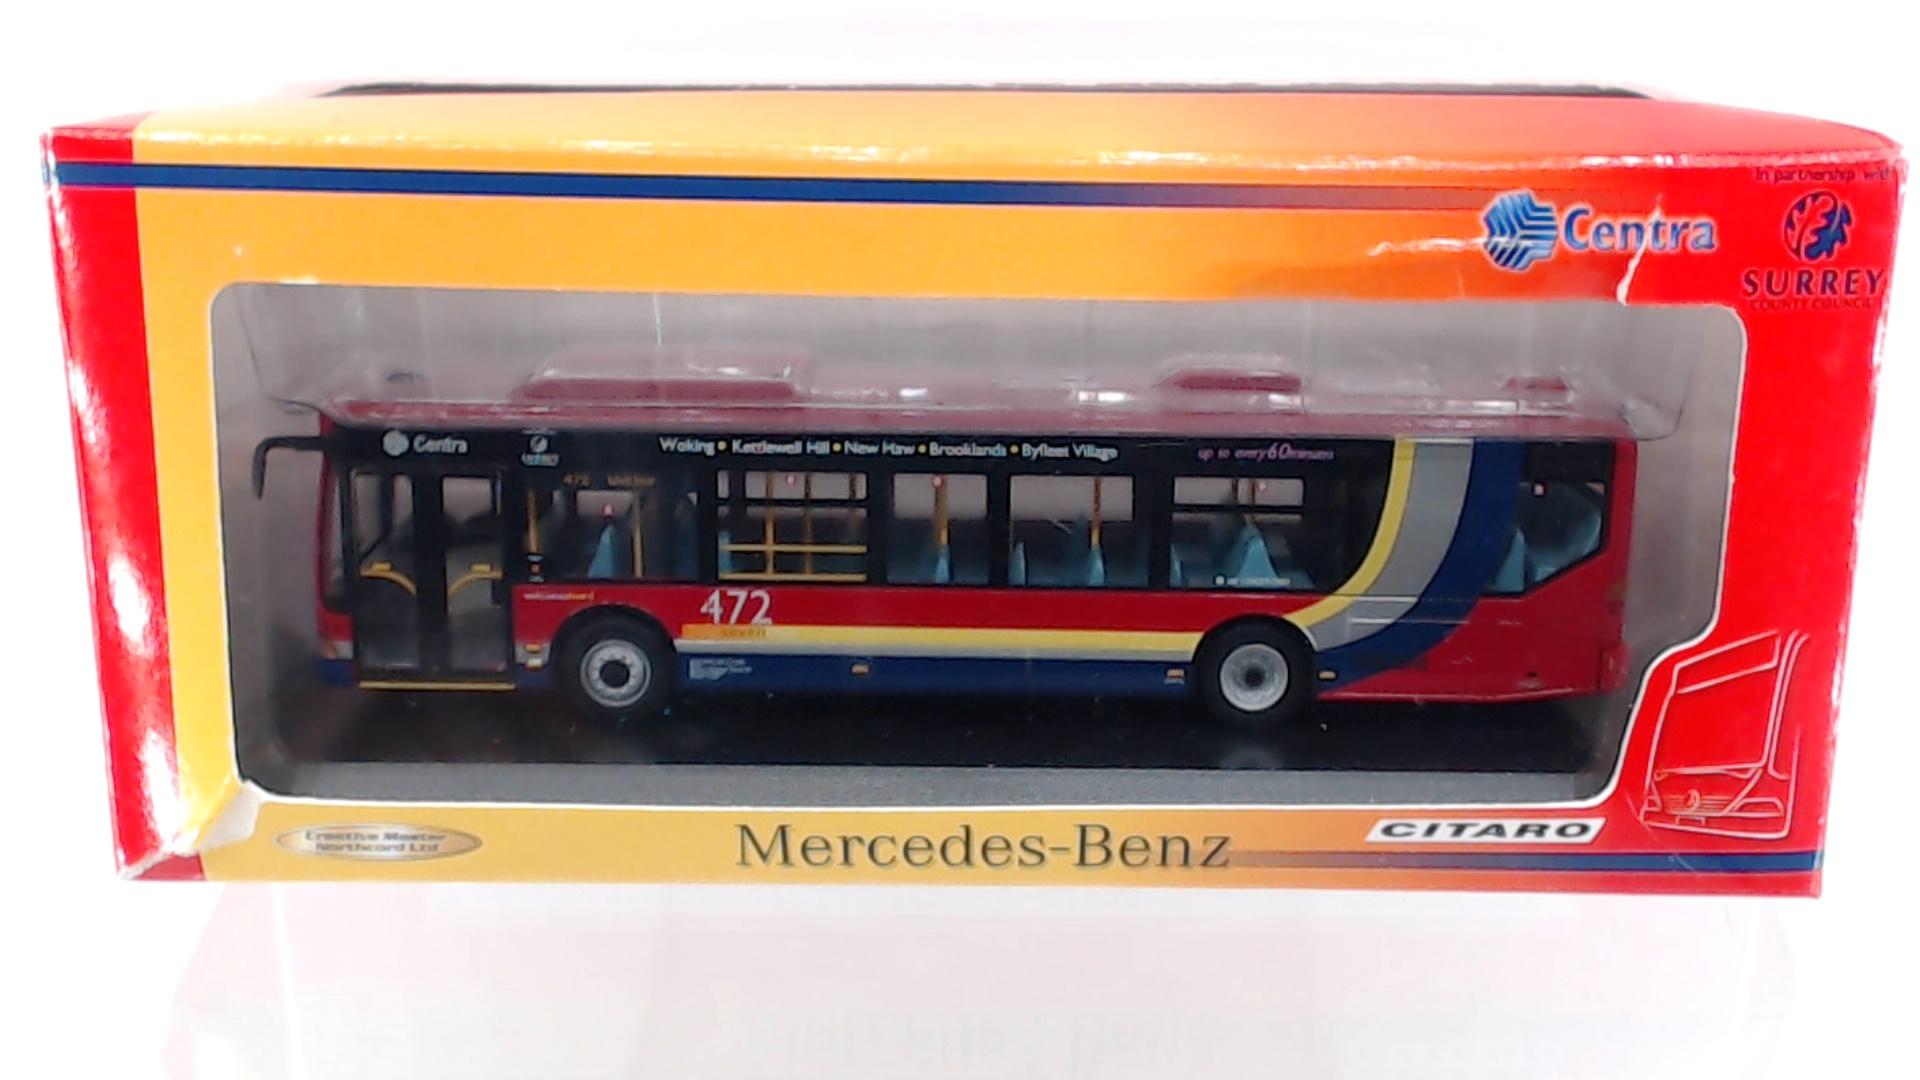 Picture Gallery for Creative Master UKBUS5005 Mercedes Benz Citaro